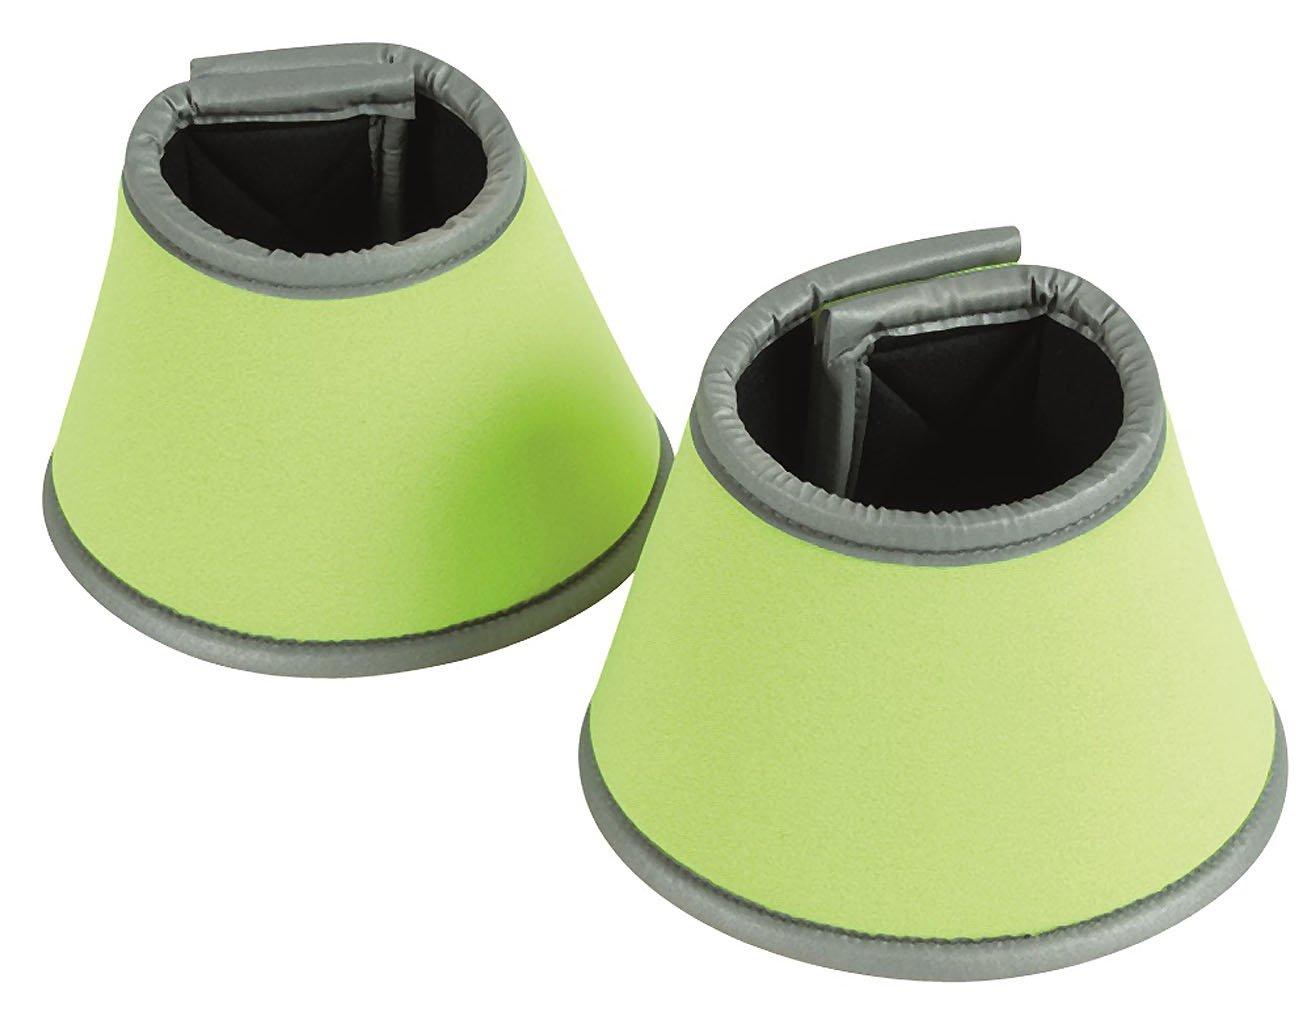 /Reflective Over-Reach Boots/Bell Boots Reflective Over-Reach Boots/Bell Boots Reflex Over Each Boots Reitsport Amesbichler